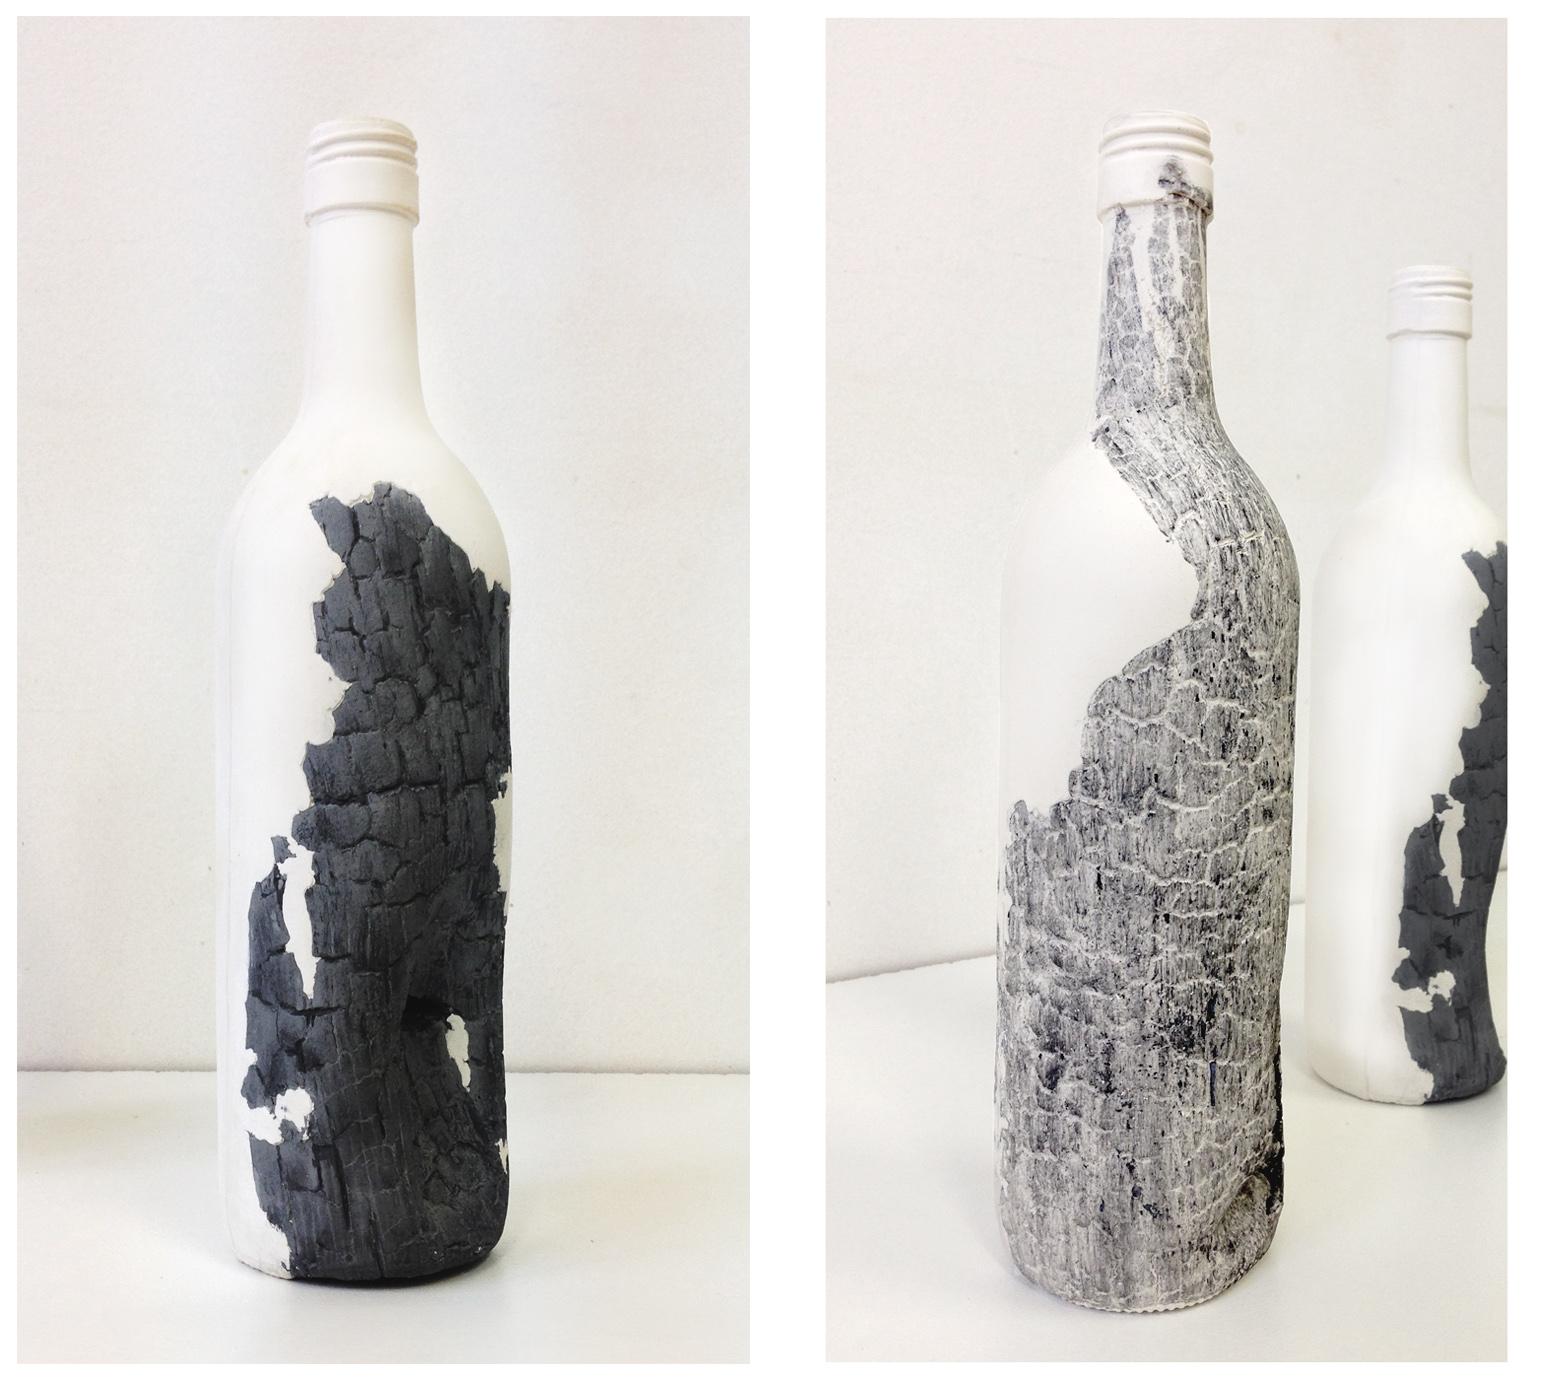 Bottle 1 & Bottle 2